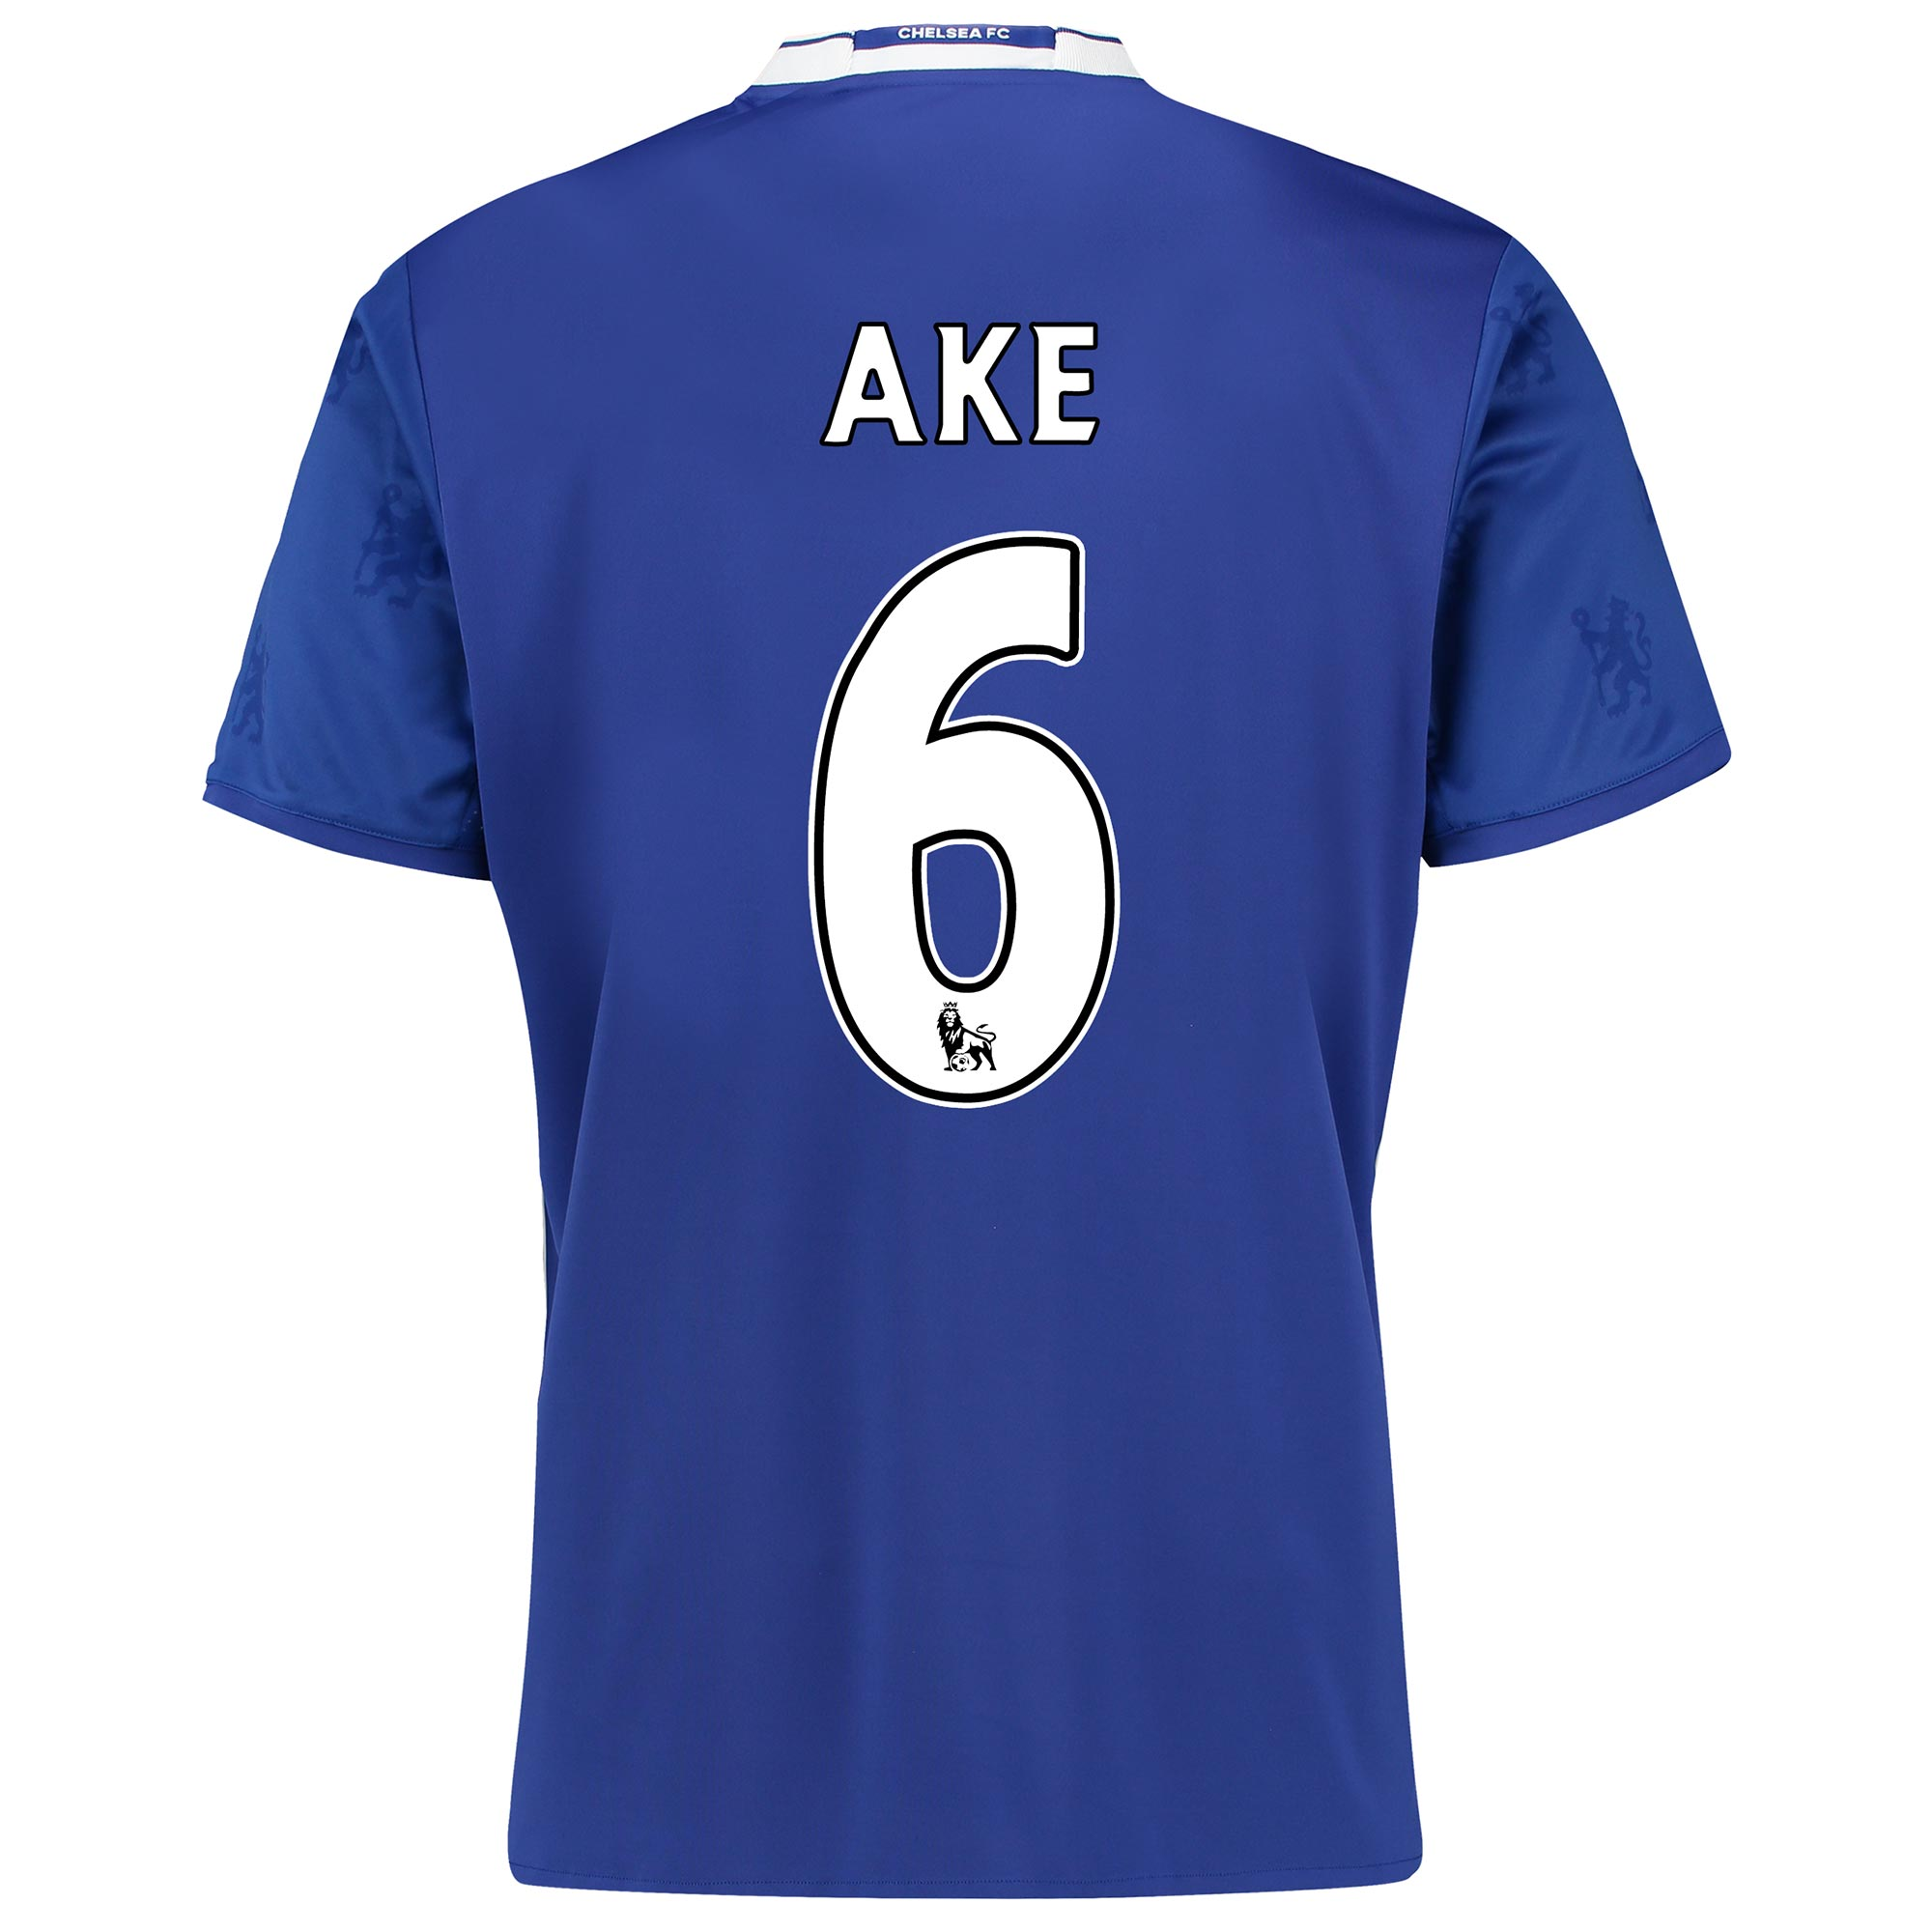 Chelsea Home Shirt 2016-17 with Ake 6 printing